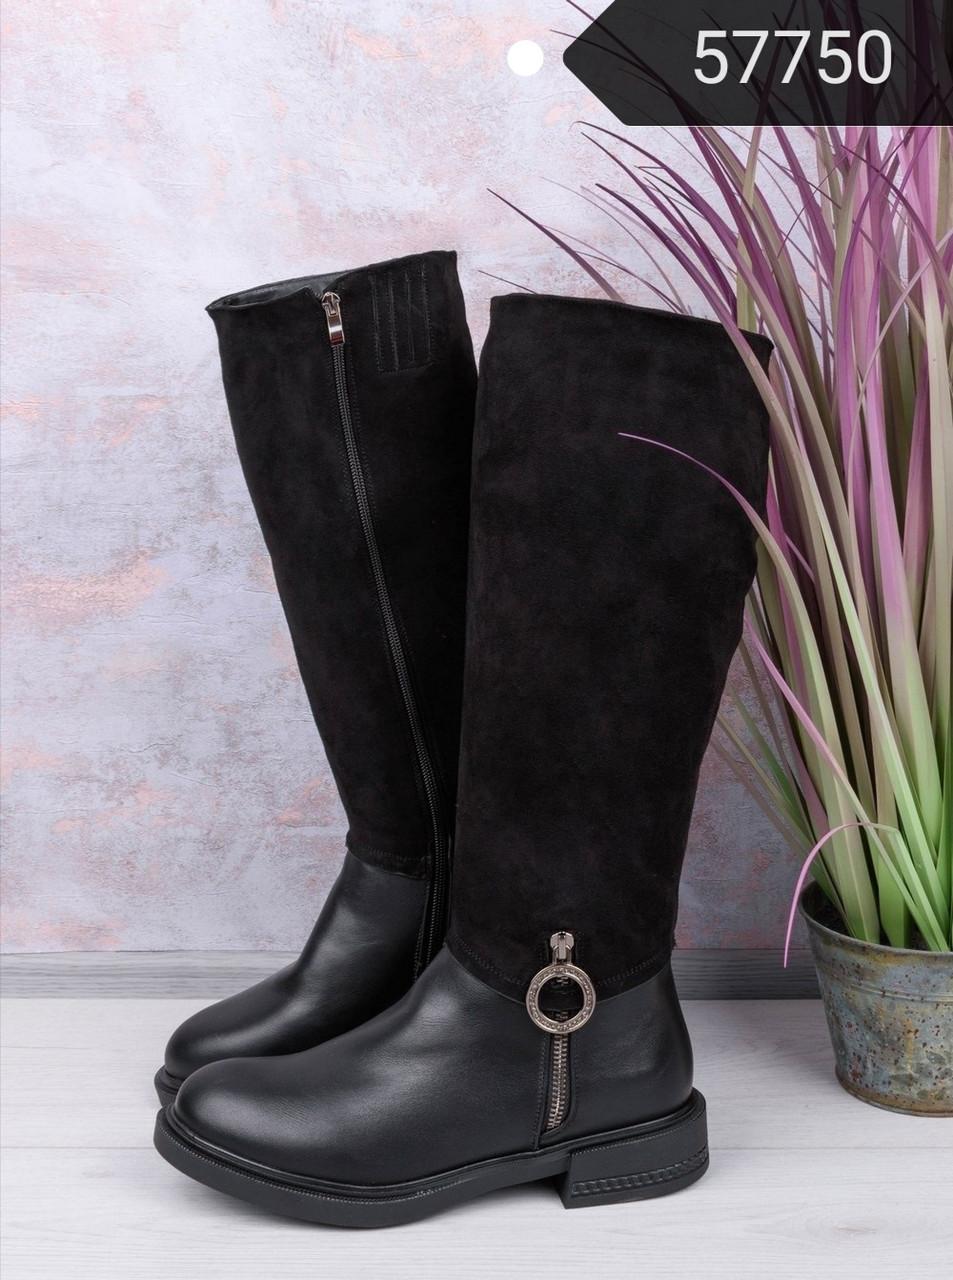 Женские сапоги черные евро ЗИМА с молнией  эко-кожа+ замша